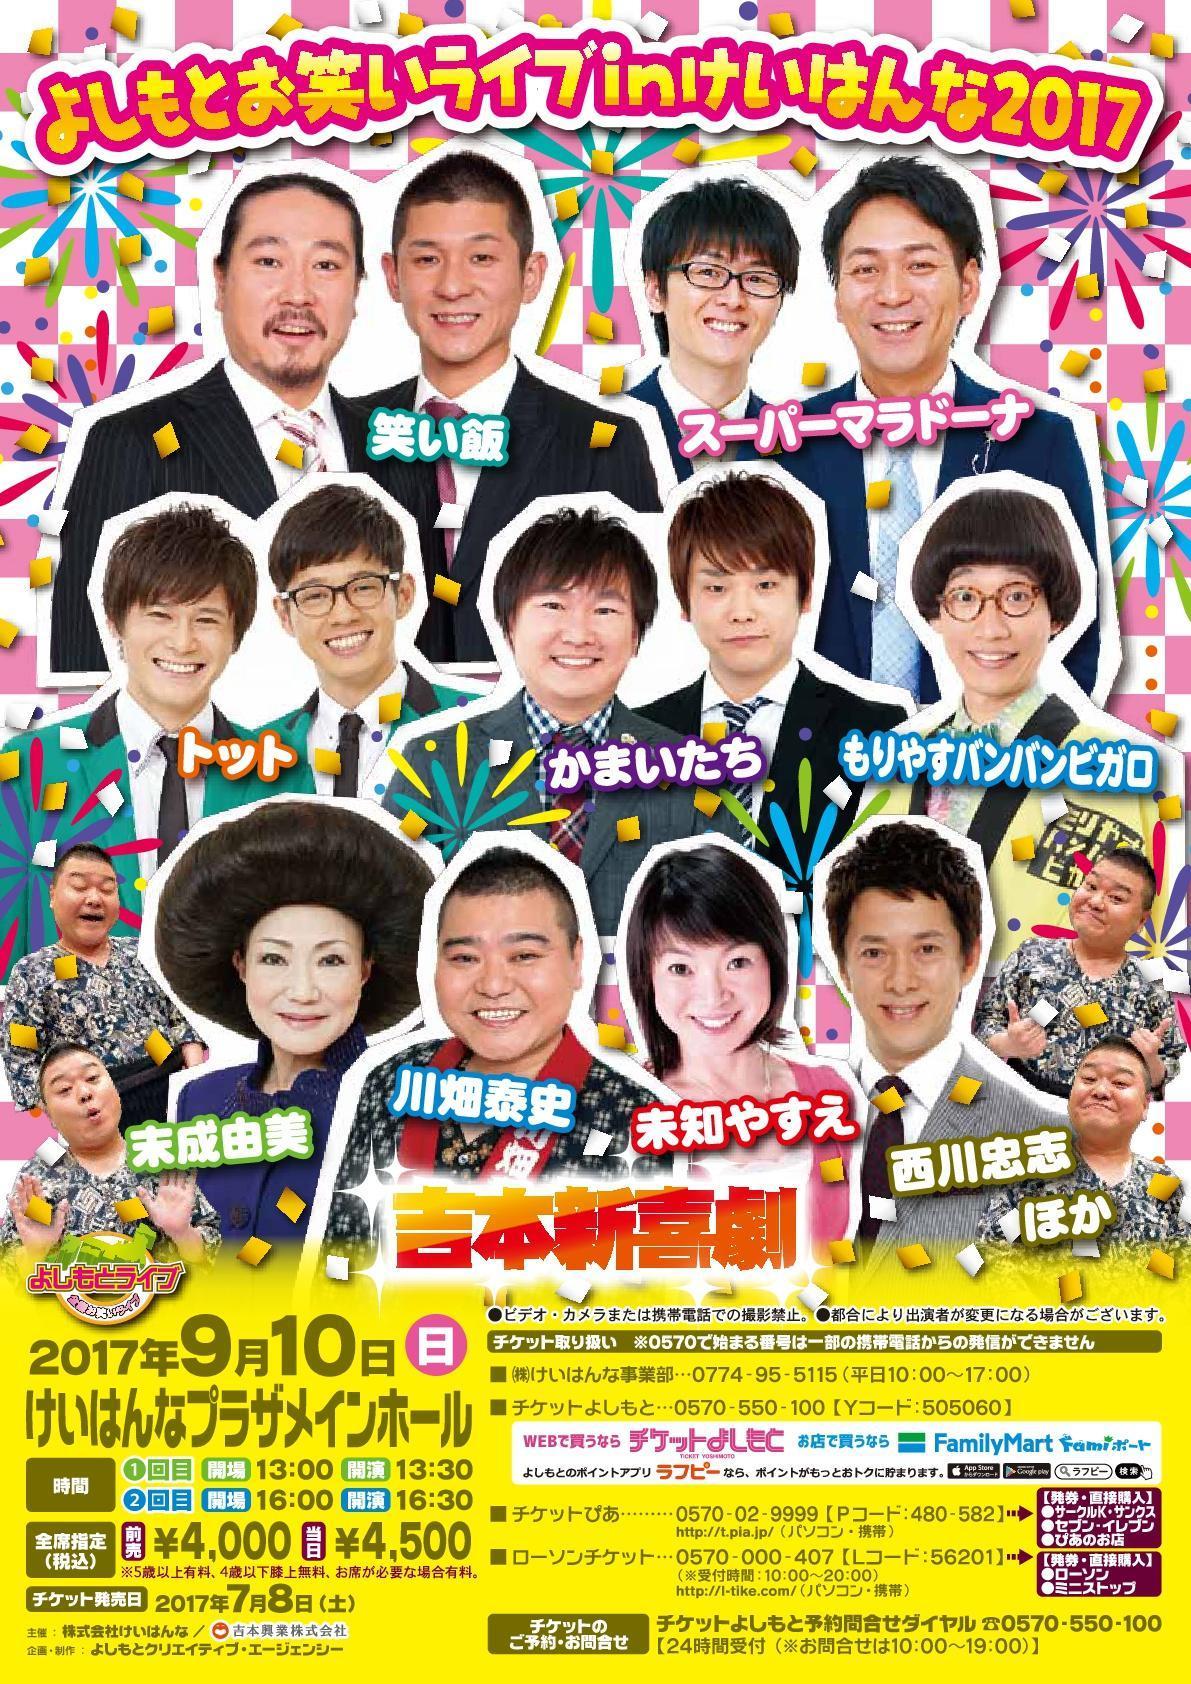 http://www.syumatsu.jp/20170710171705-da19d7b2f80408c2762ed760accc61f22a452fe3.jpg